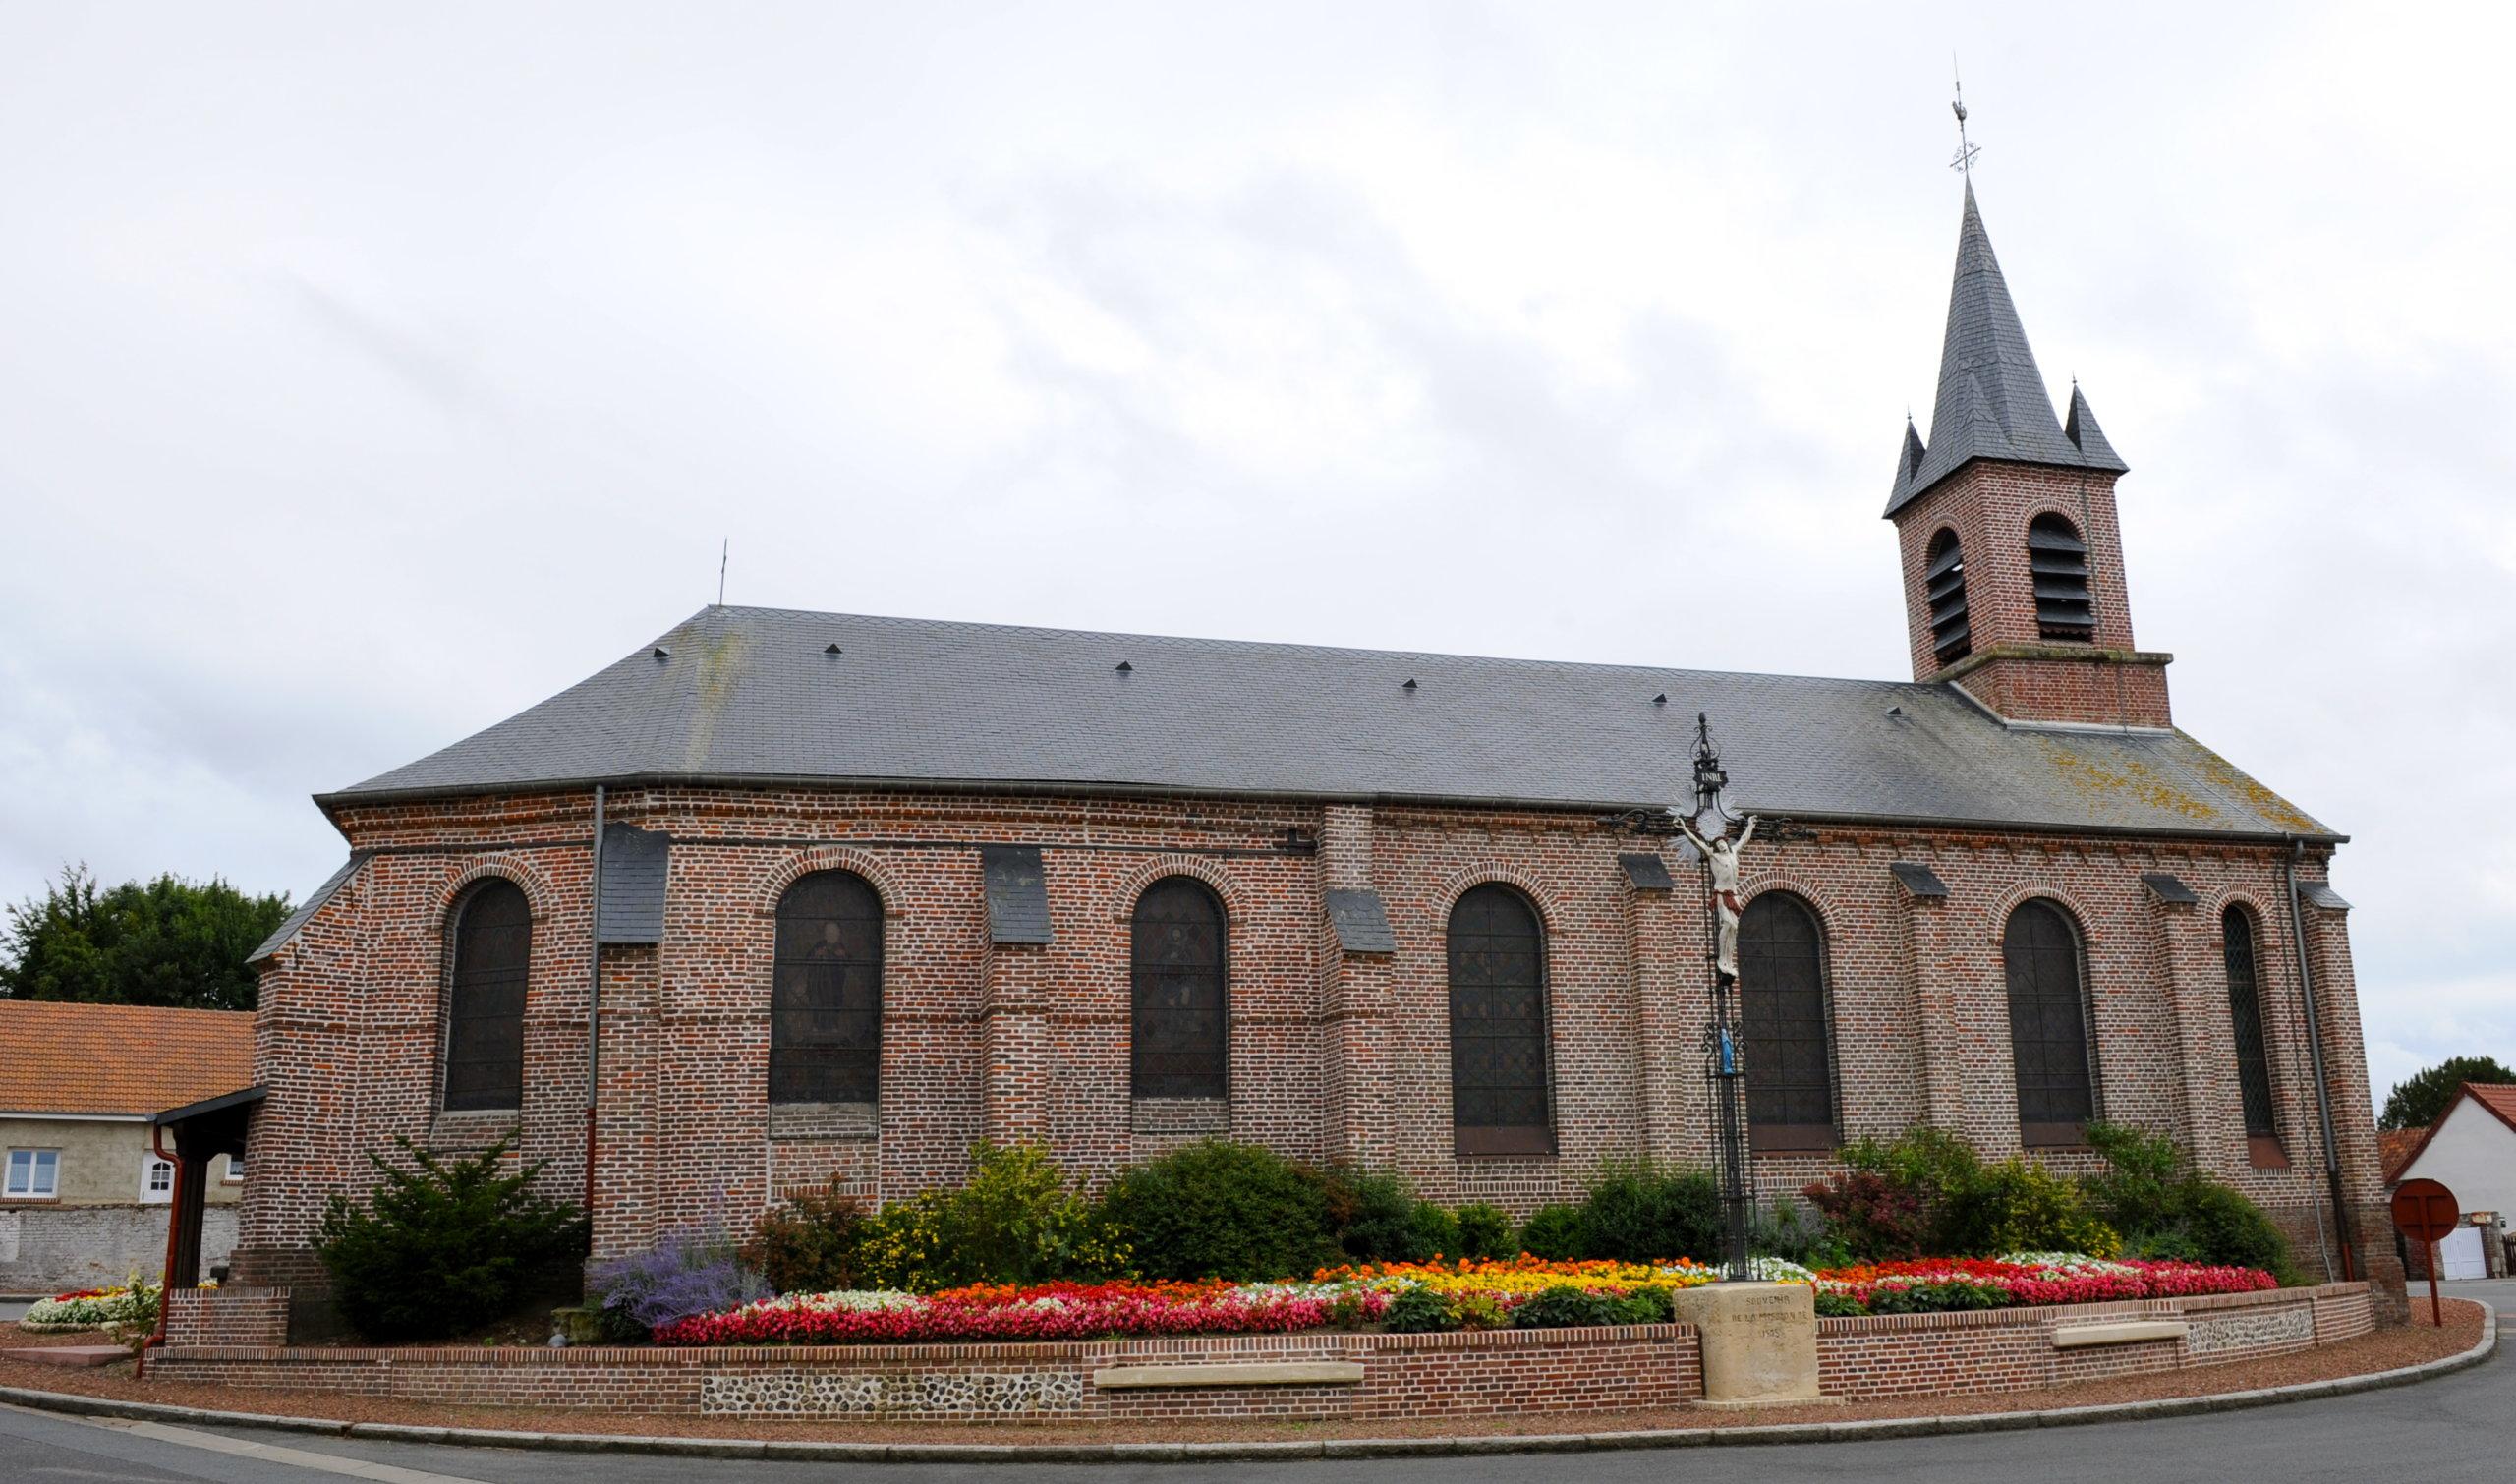 Eglise Feuquières-en-Vimeu